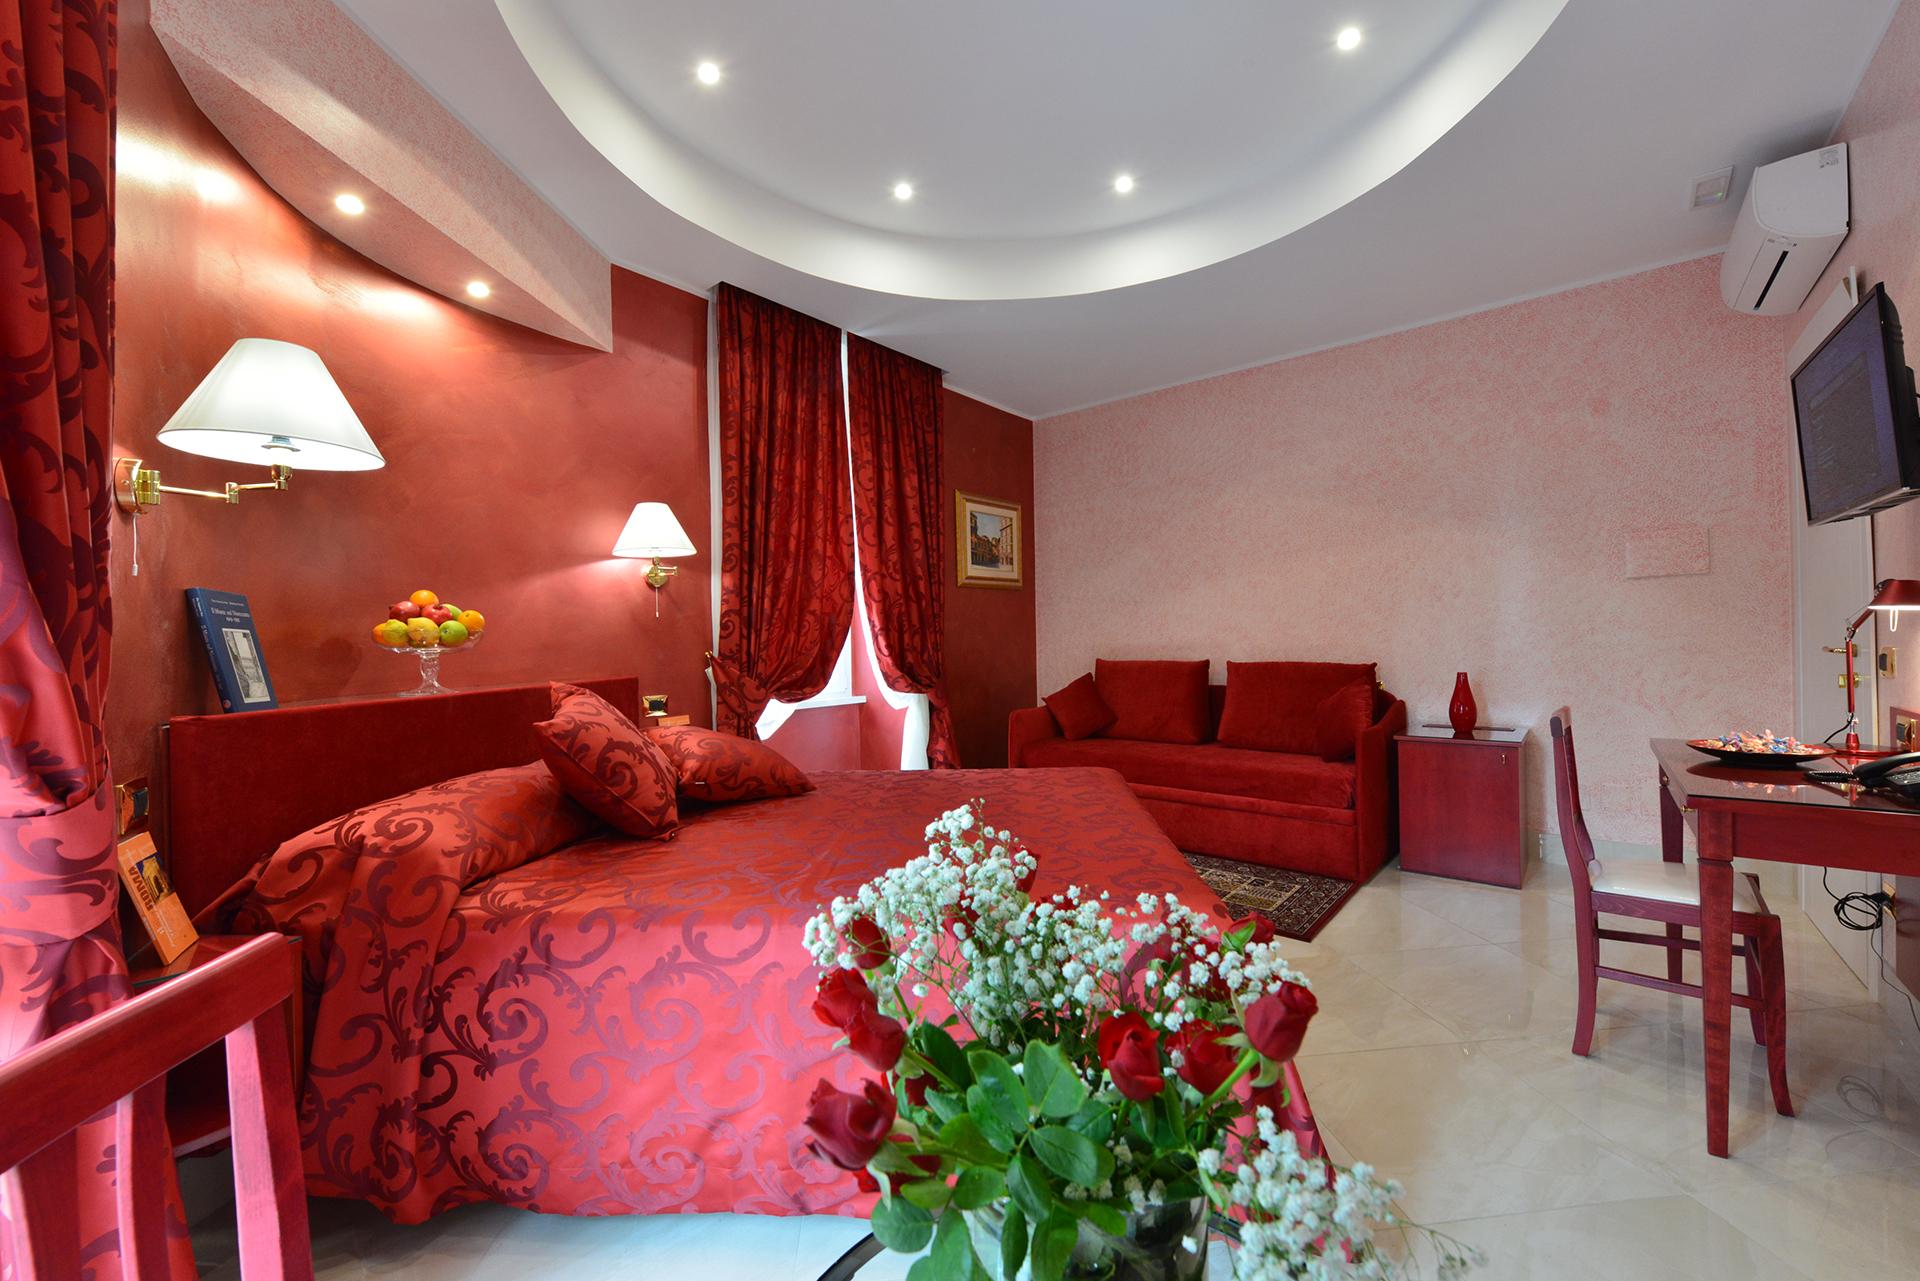 luxury guest house fabio dei velapazza roma